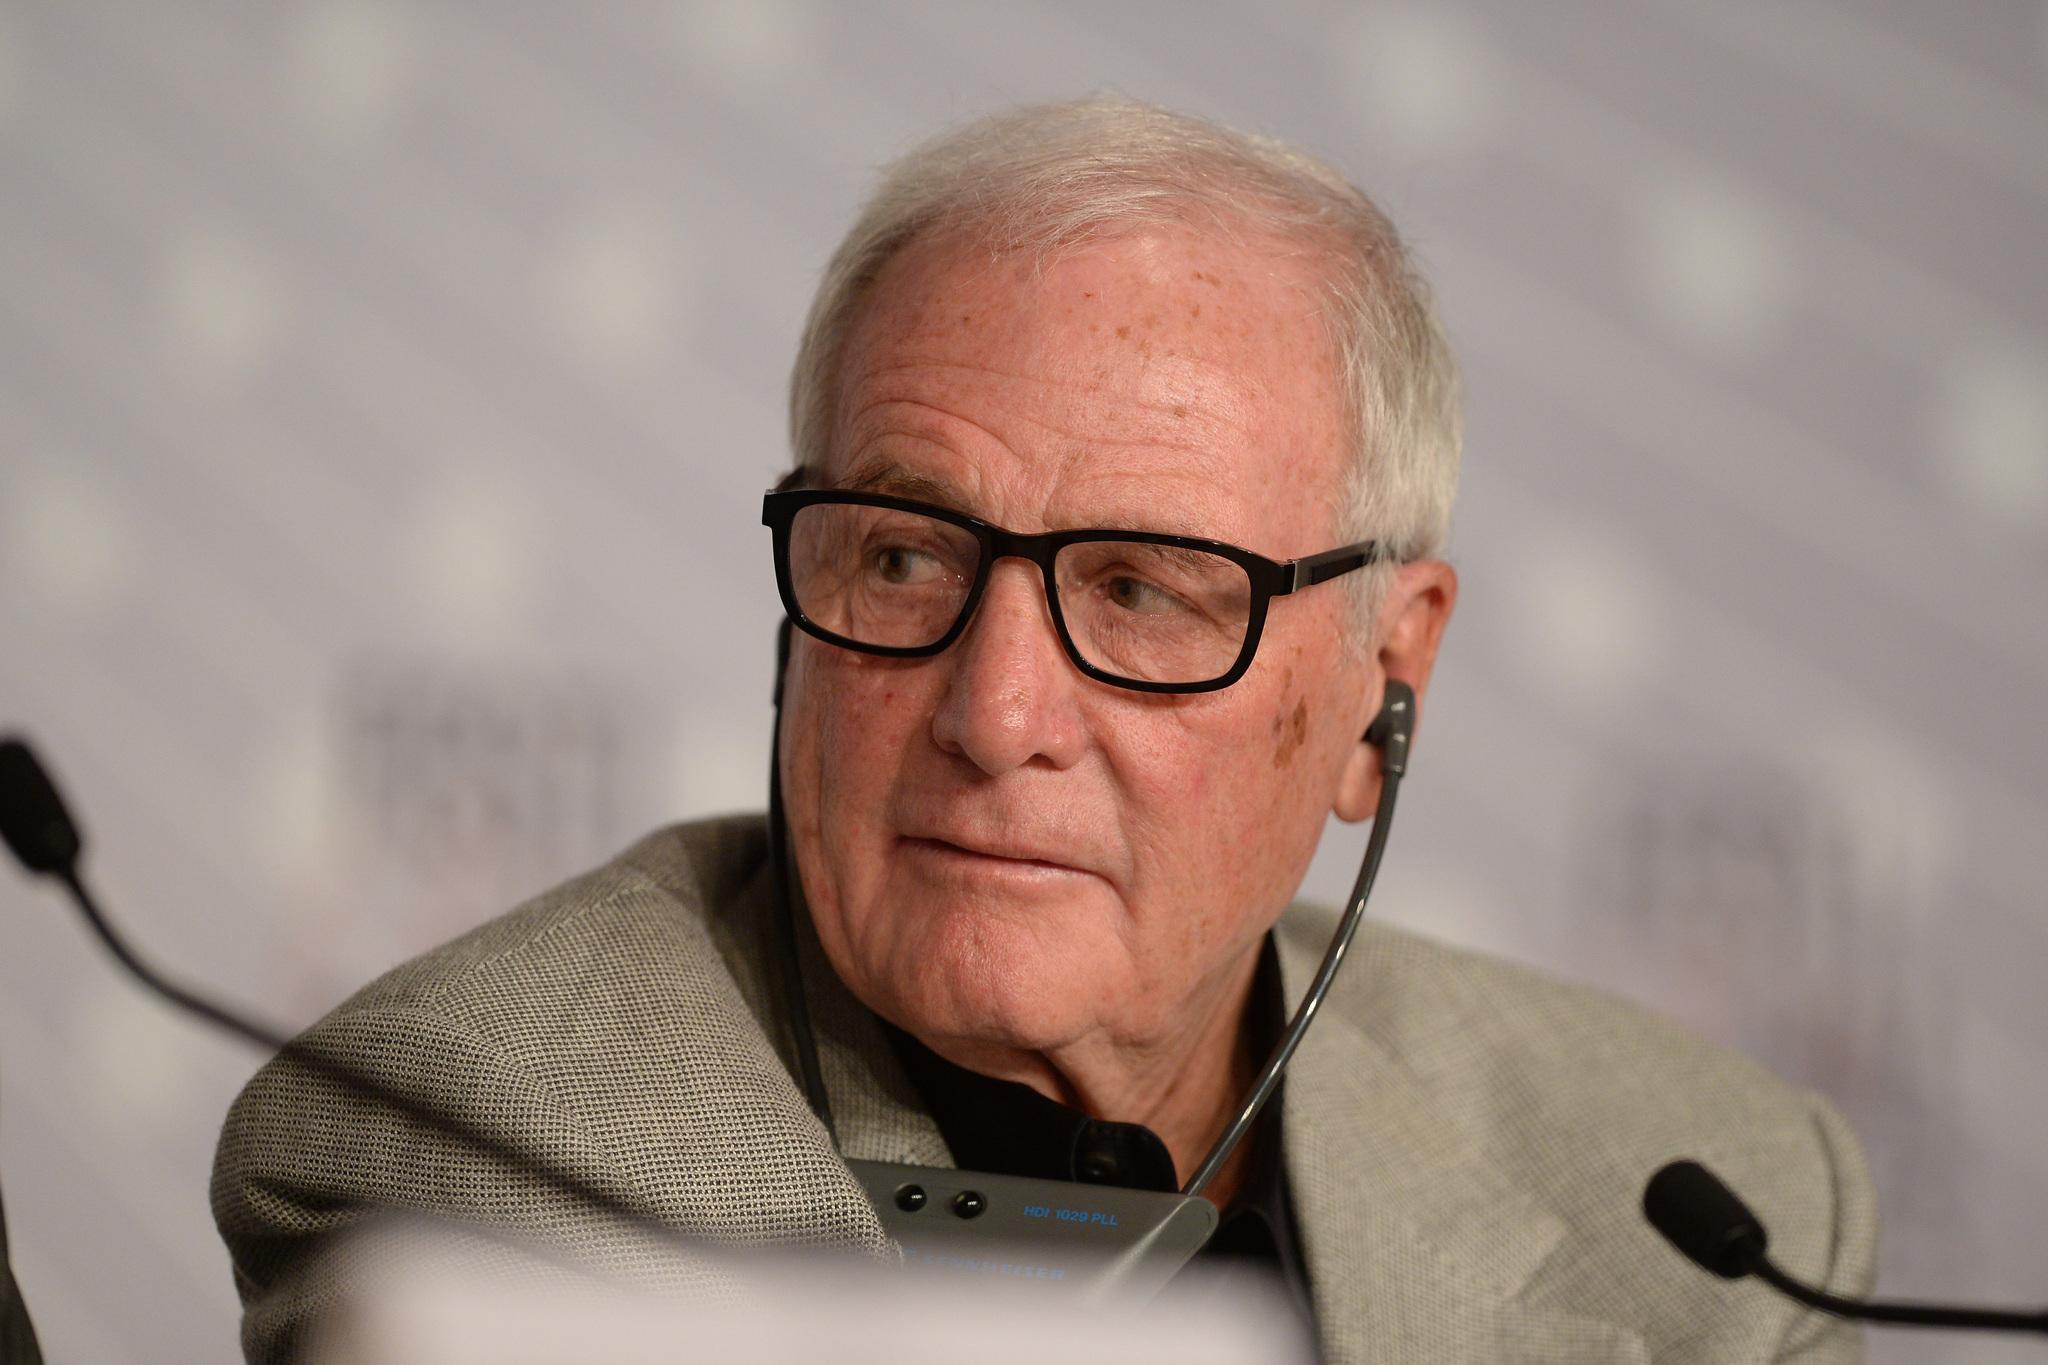 Jerry Weintraub Legendary Producer Dead At 77